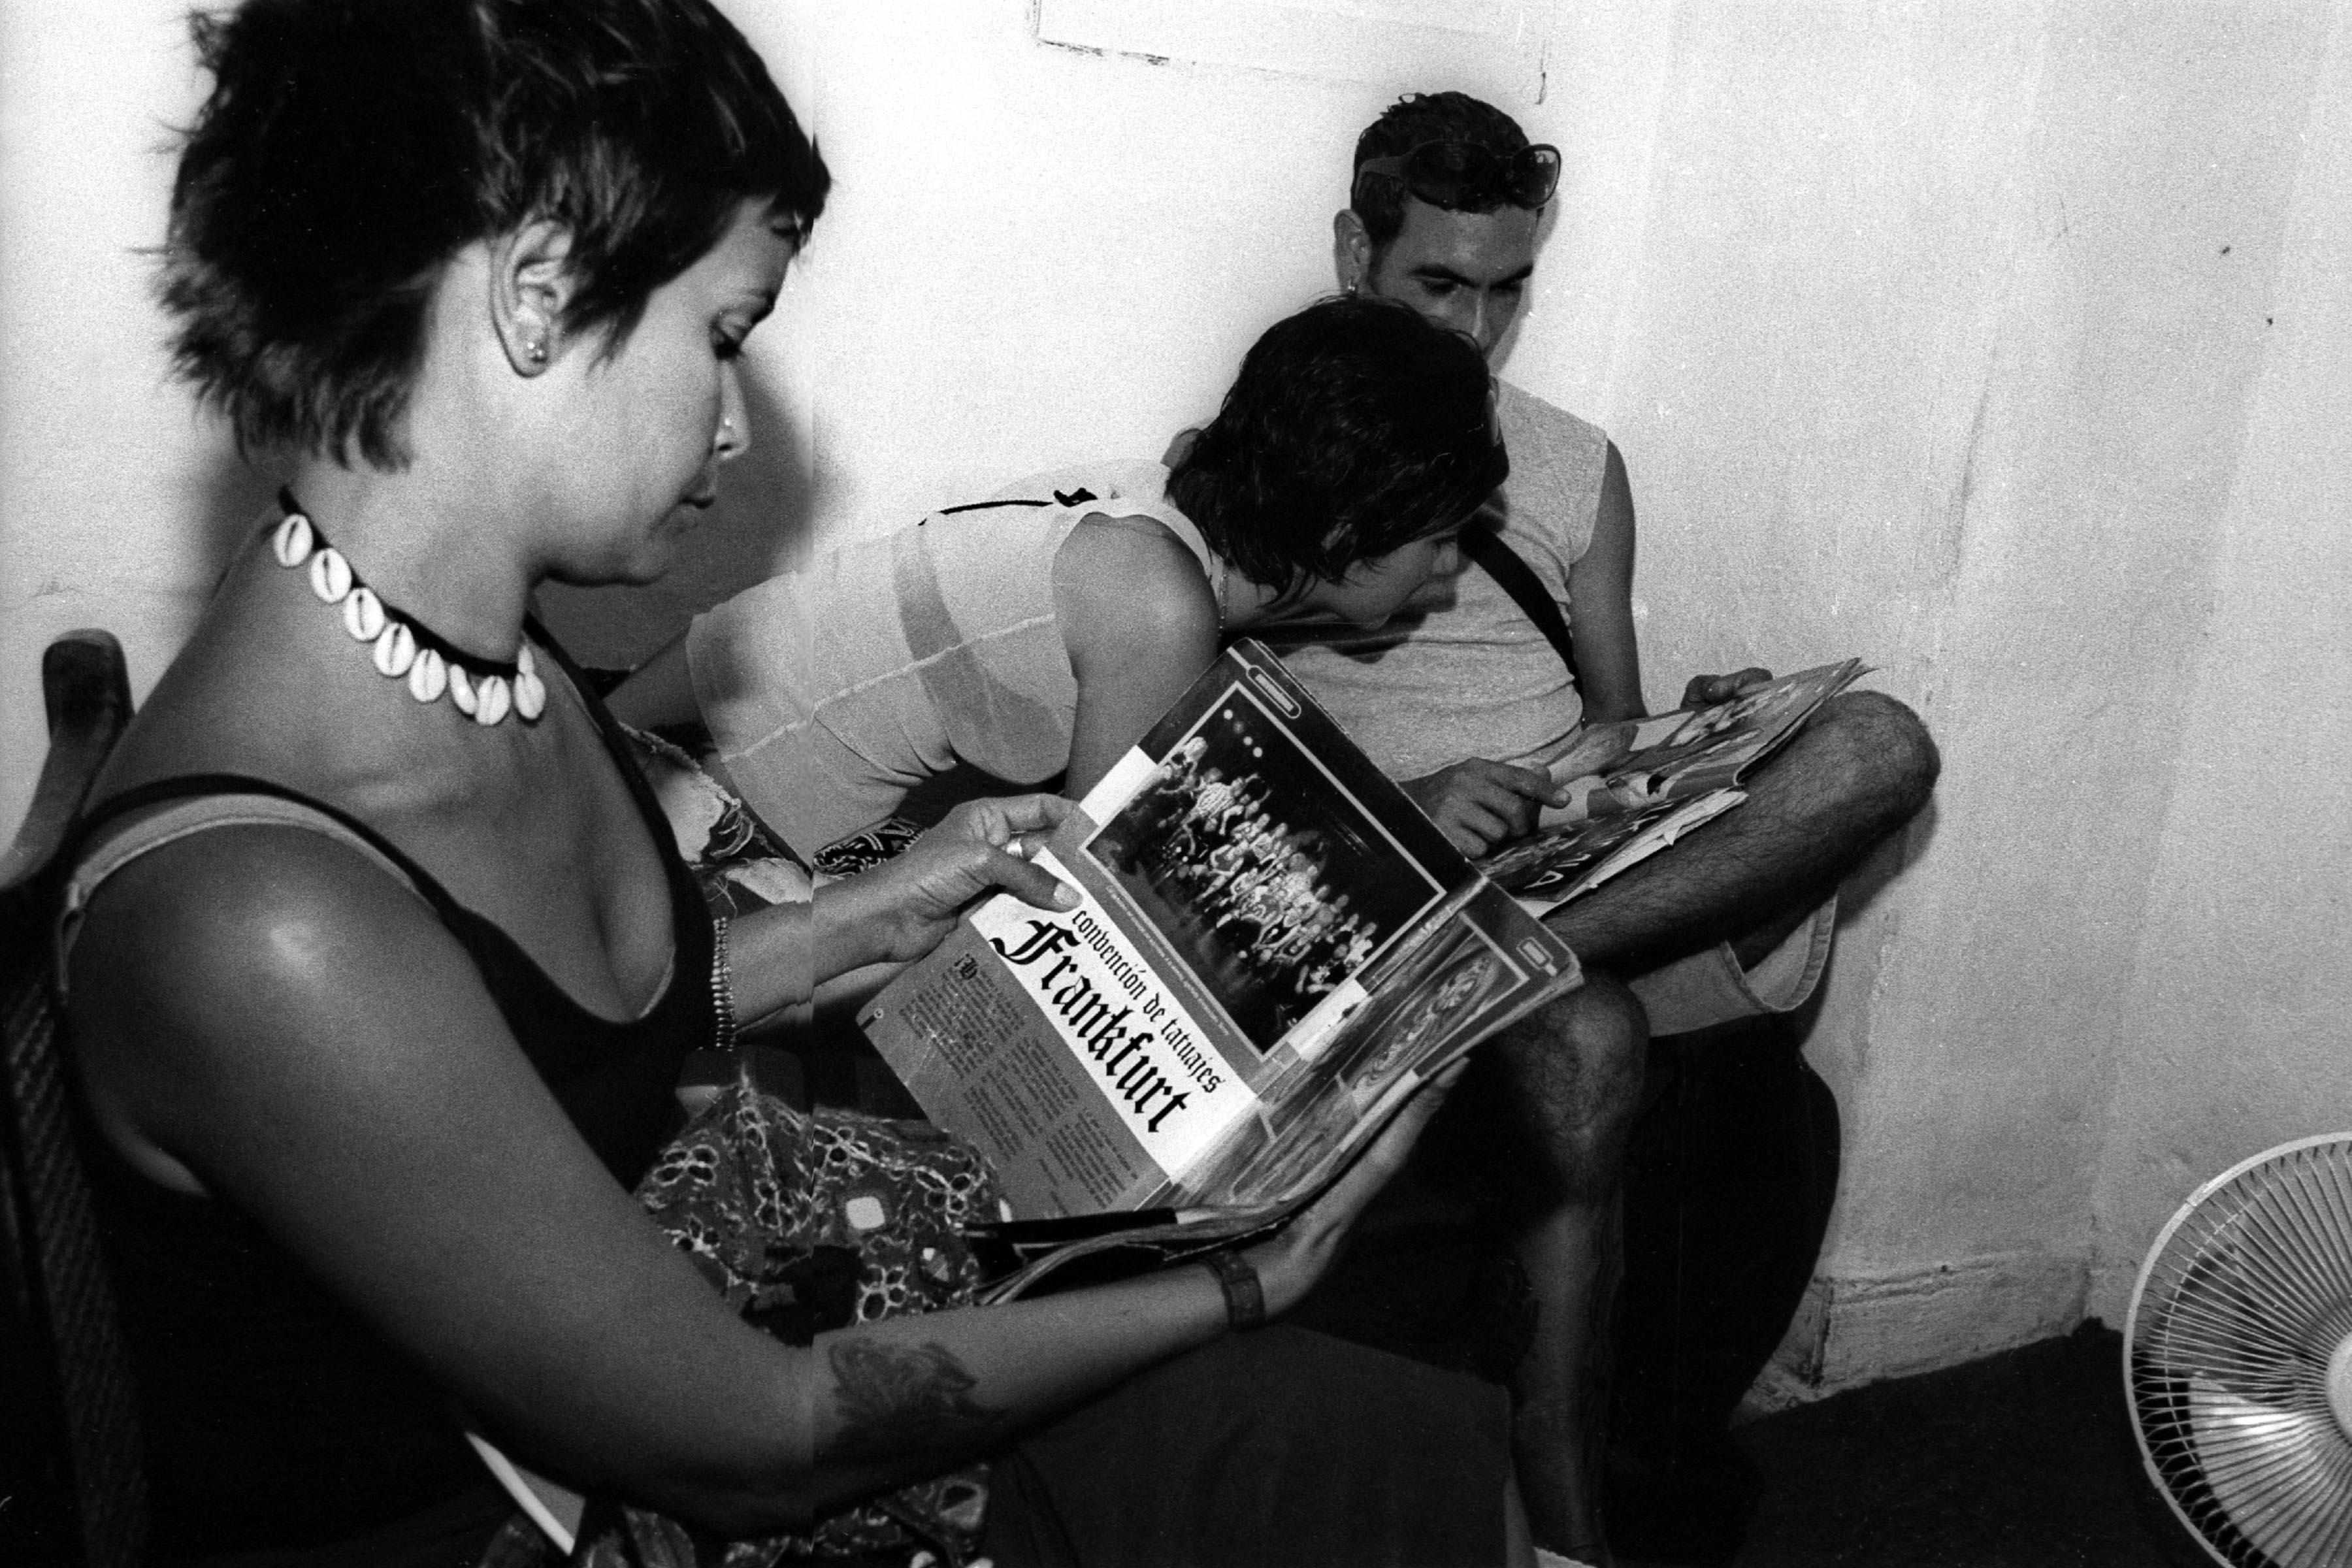 CUBA: Tattoo Parlor